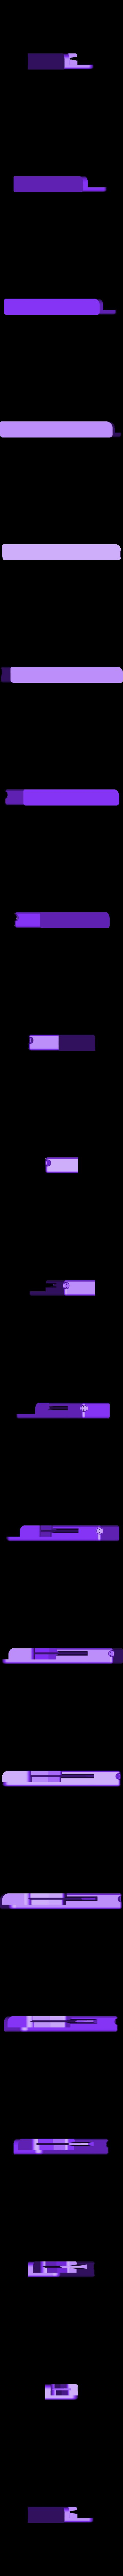 LED_BLADE_BODY.stl Download free STL file LED BLADE • Design to 3D print, MuSSy